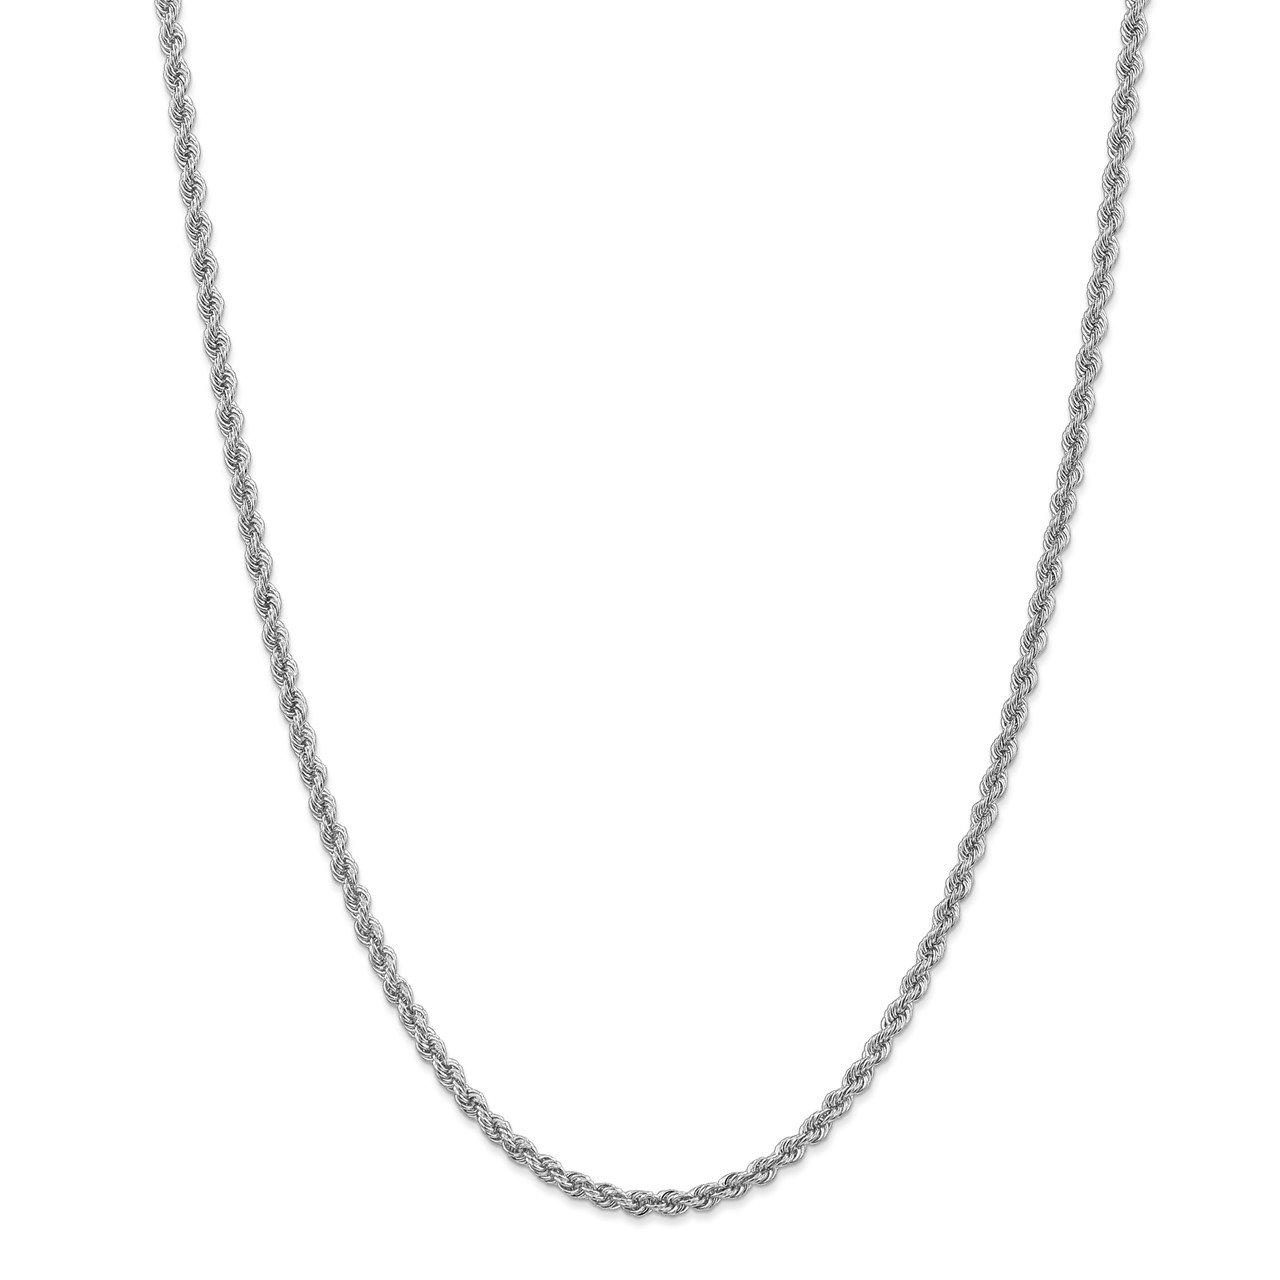 14k WG 3.0mm Regular Rope Chain